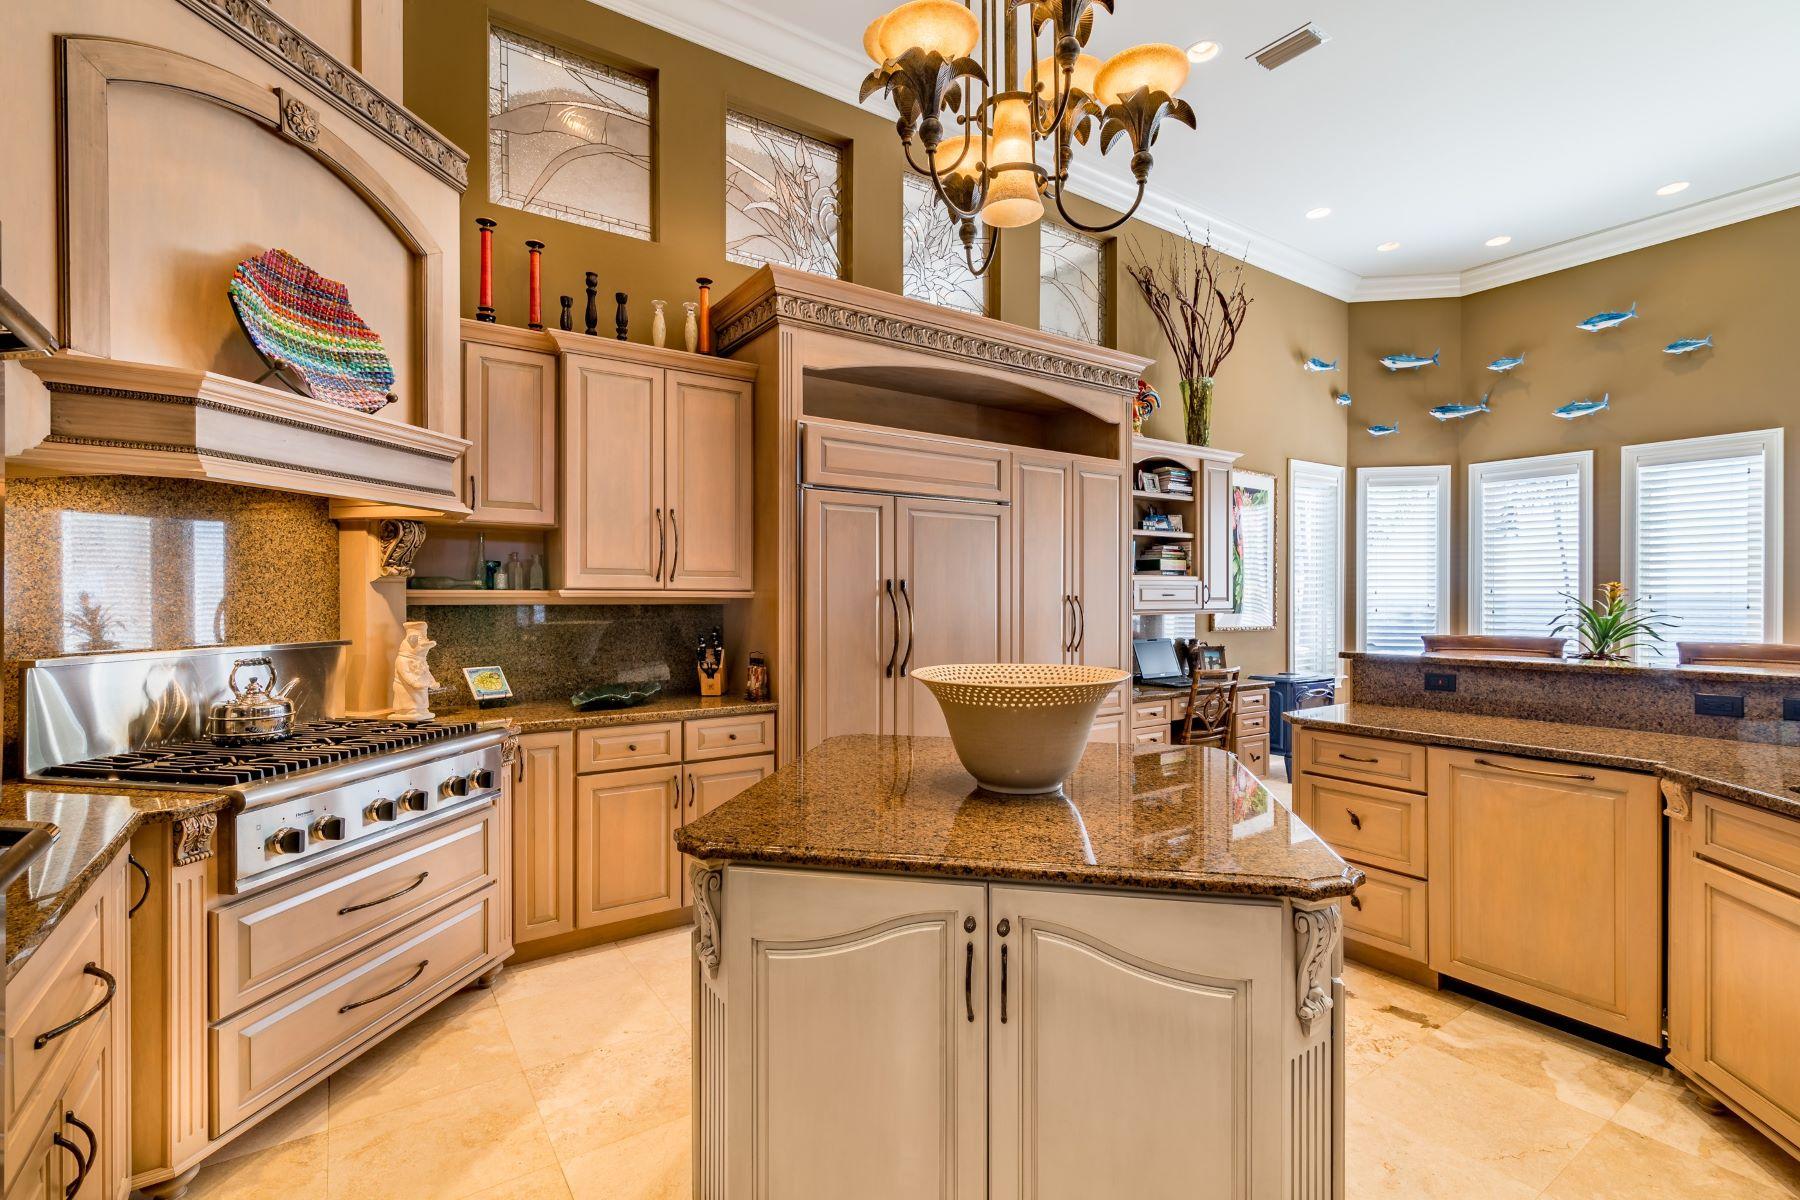 Additional photo for property listing at 200 Riverside Drive, Melbourne Beach, FL 200 Riverside Drive Melbourne Beach, Florida 32951 Verenigde Staten